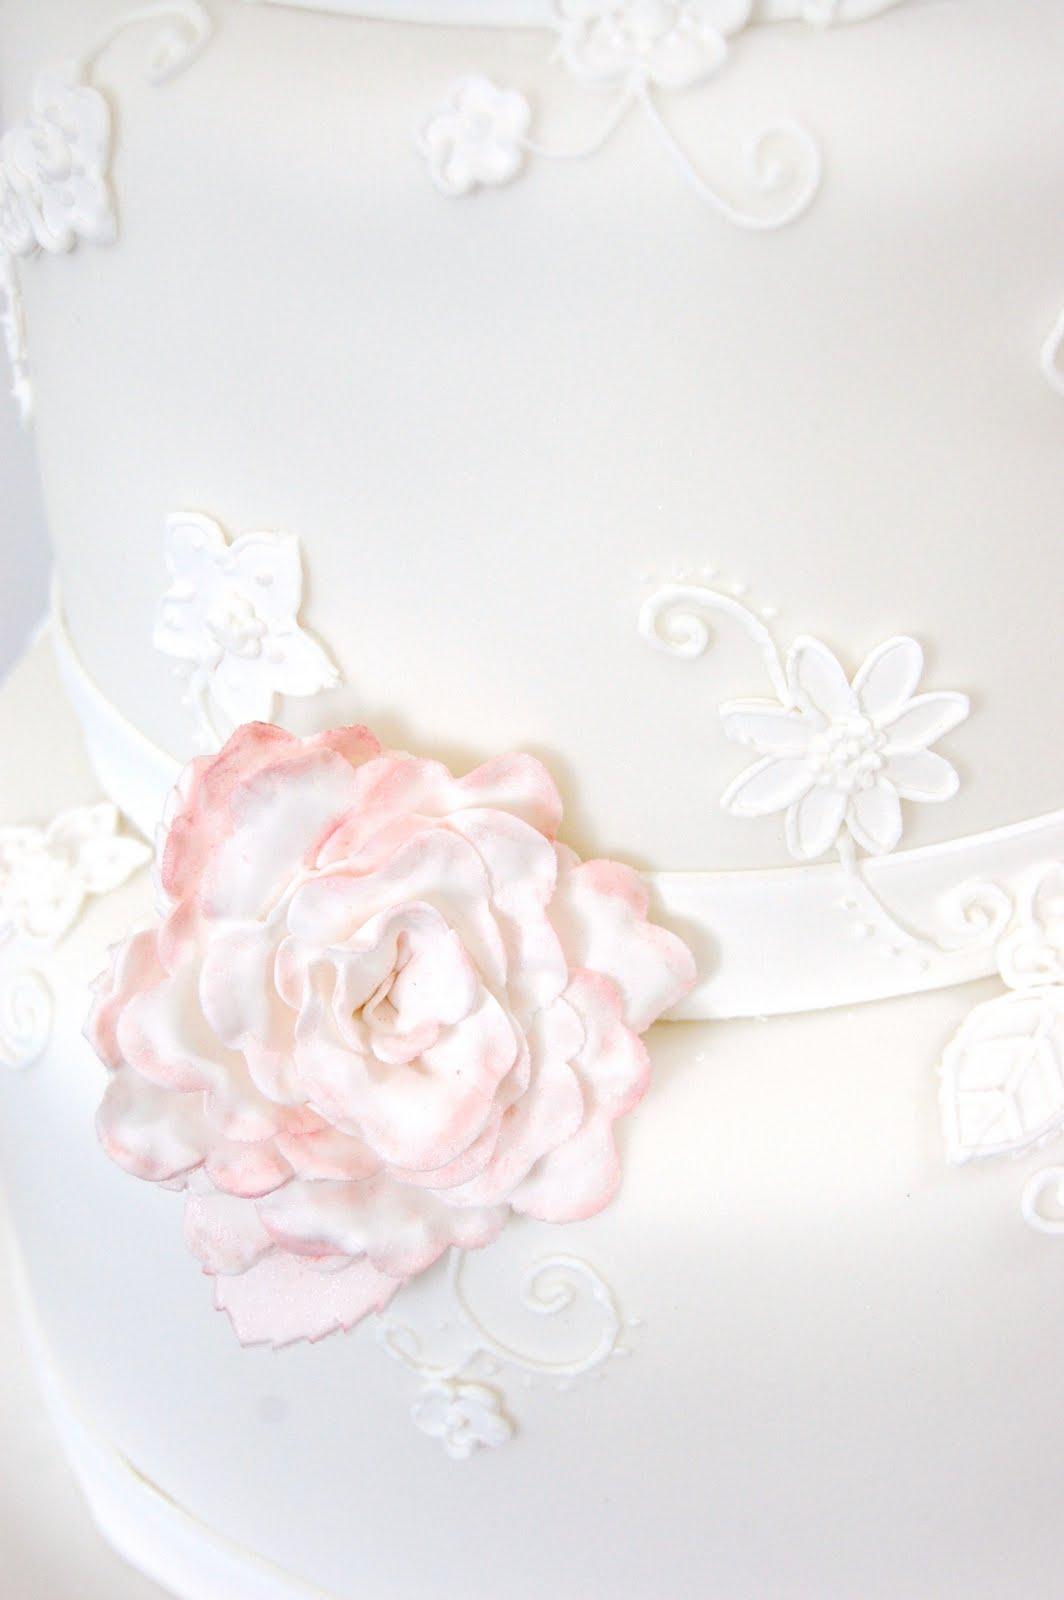 iced: Romantic Garden Wedding Cake 23 July 2011